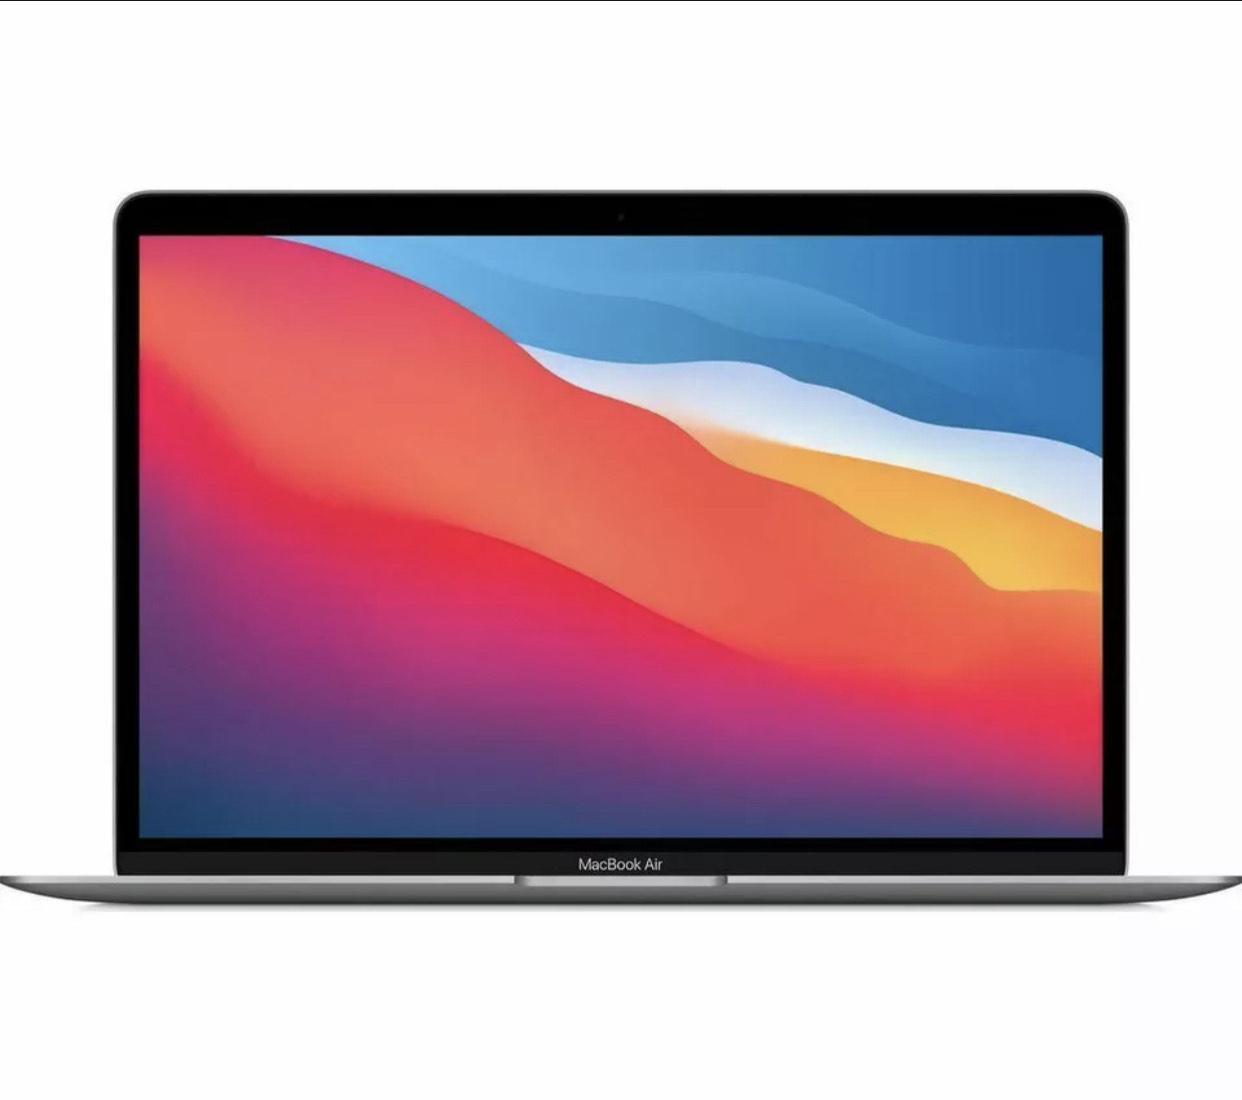 "APPLE M1 13.3"" MacBook Air - 256 GB SSD, Space Grey - Damage Box - £773.85 @ eBay / Currys Clearance"